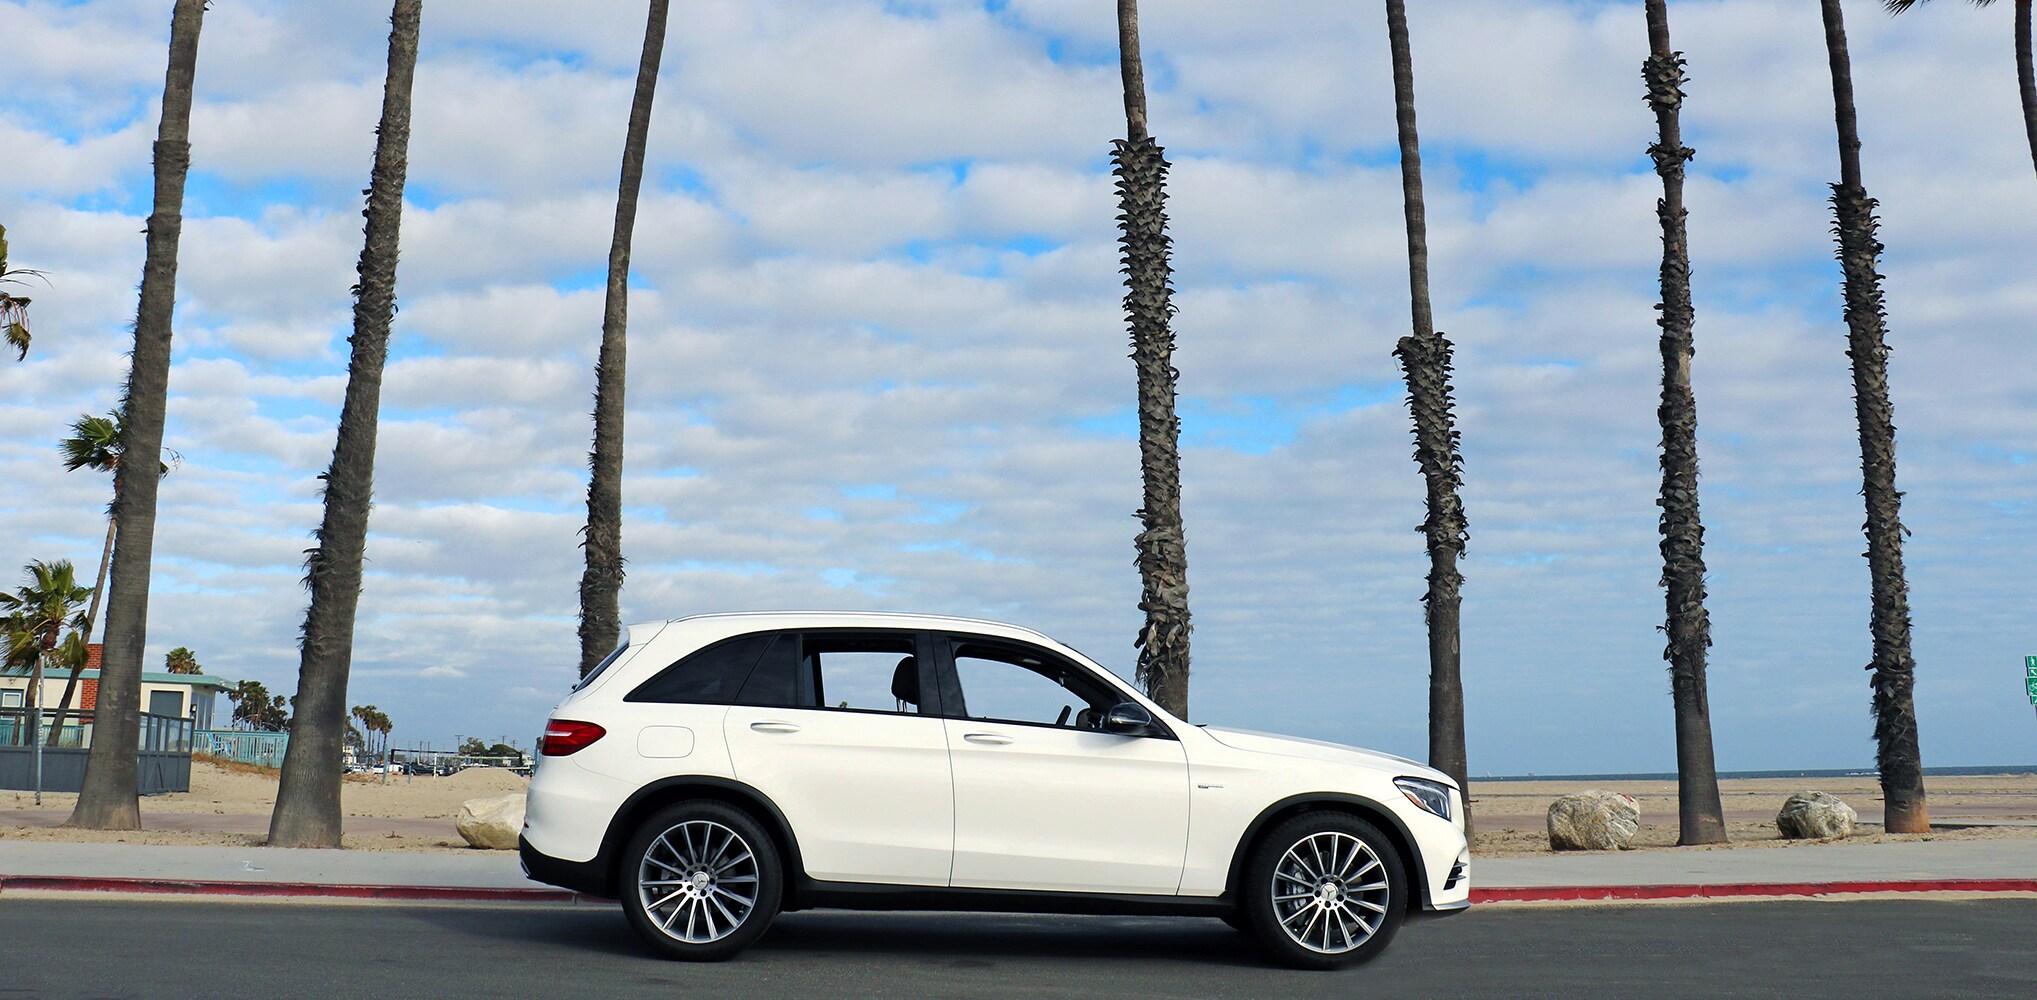 Long Beach Mercedes | Best News of Upcoming Cars